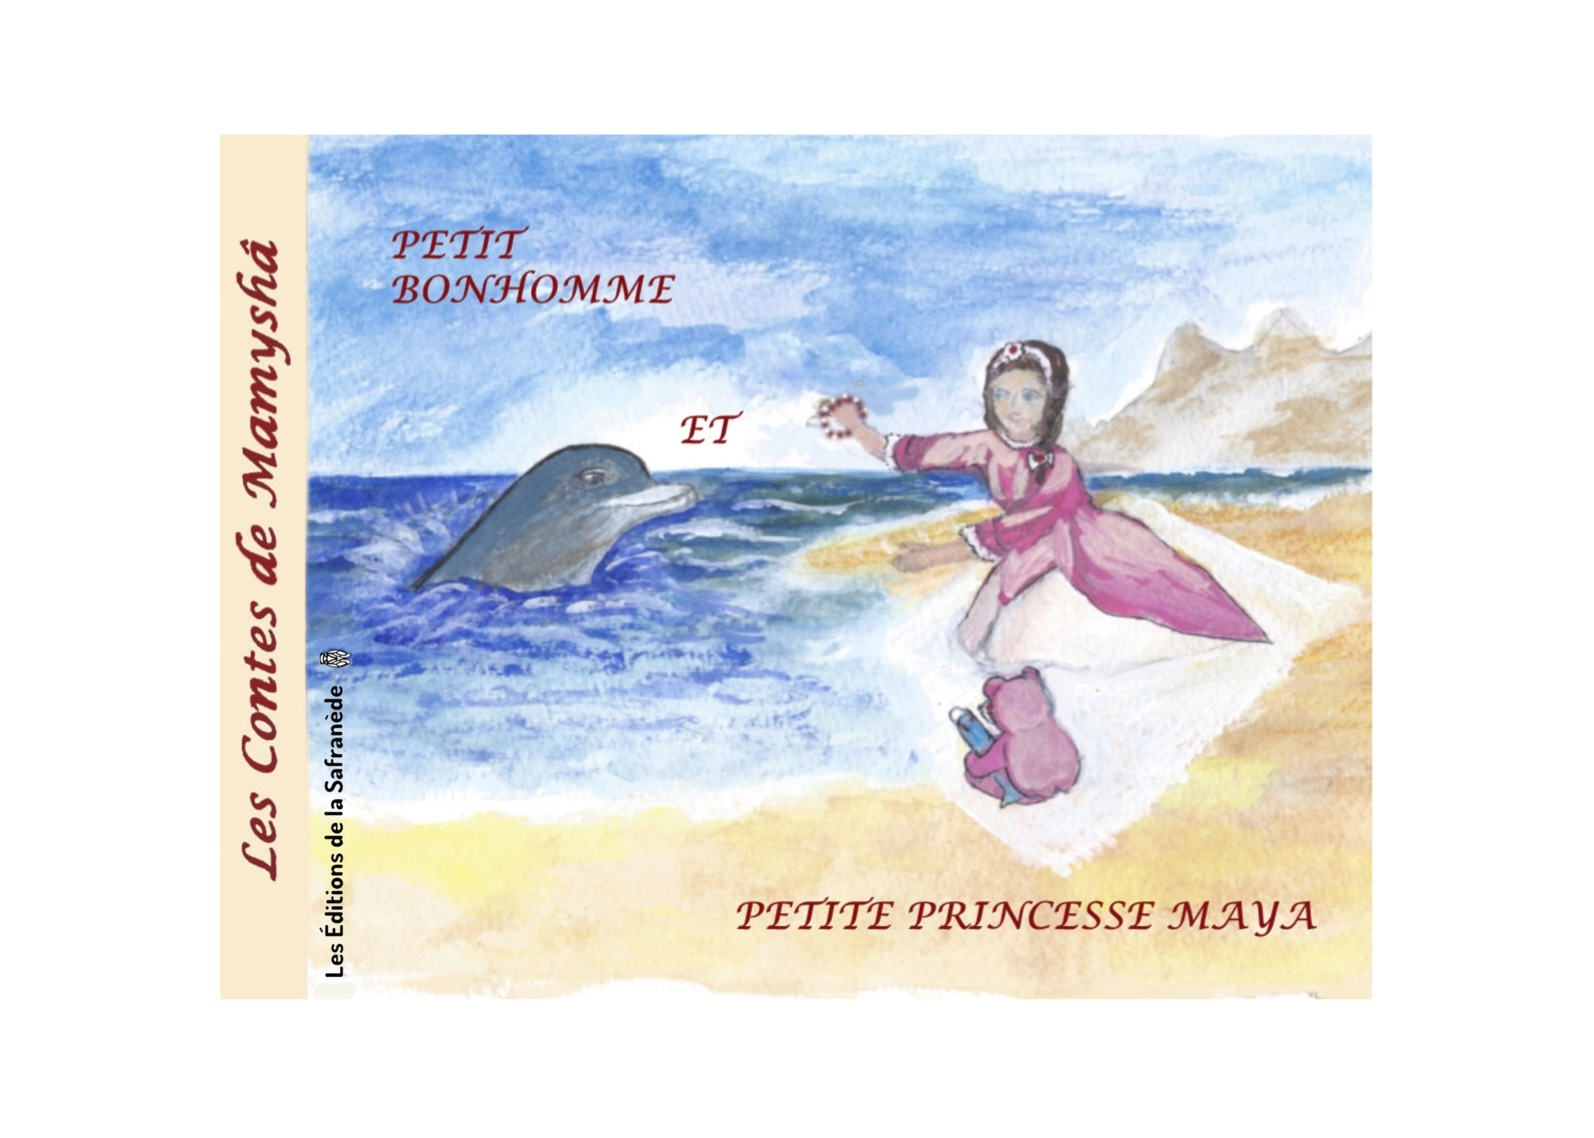 PETIT BONHOMME ET PETITE PRINCESSE MAYA